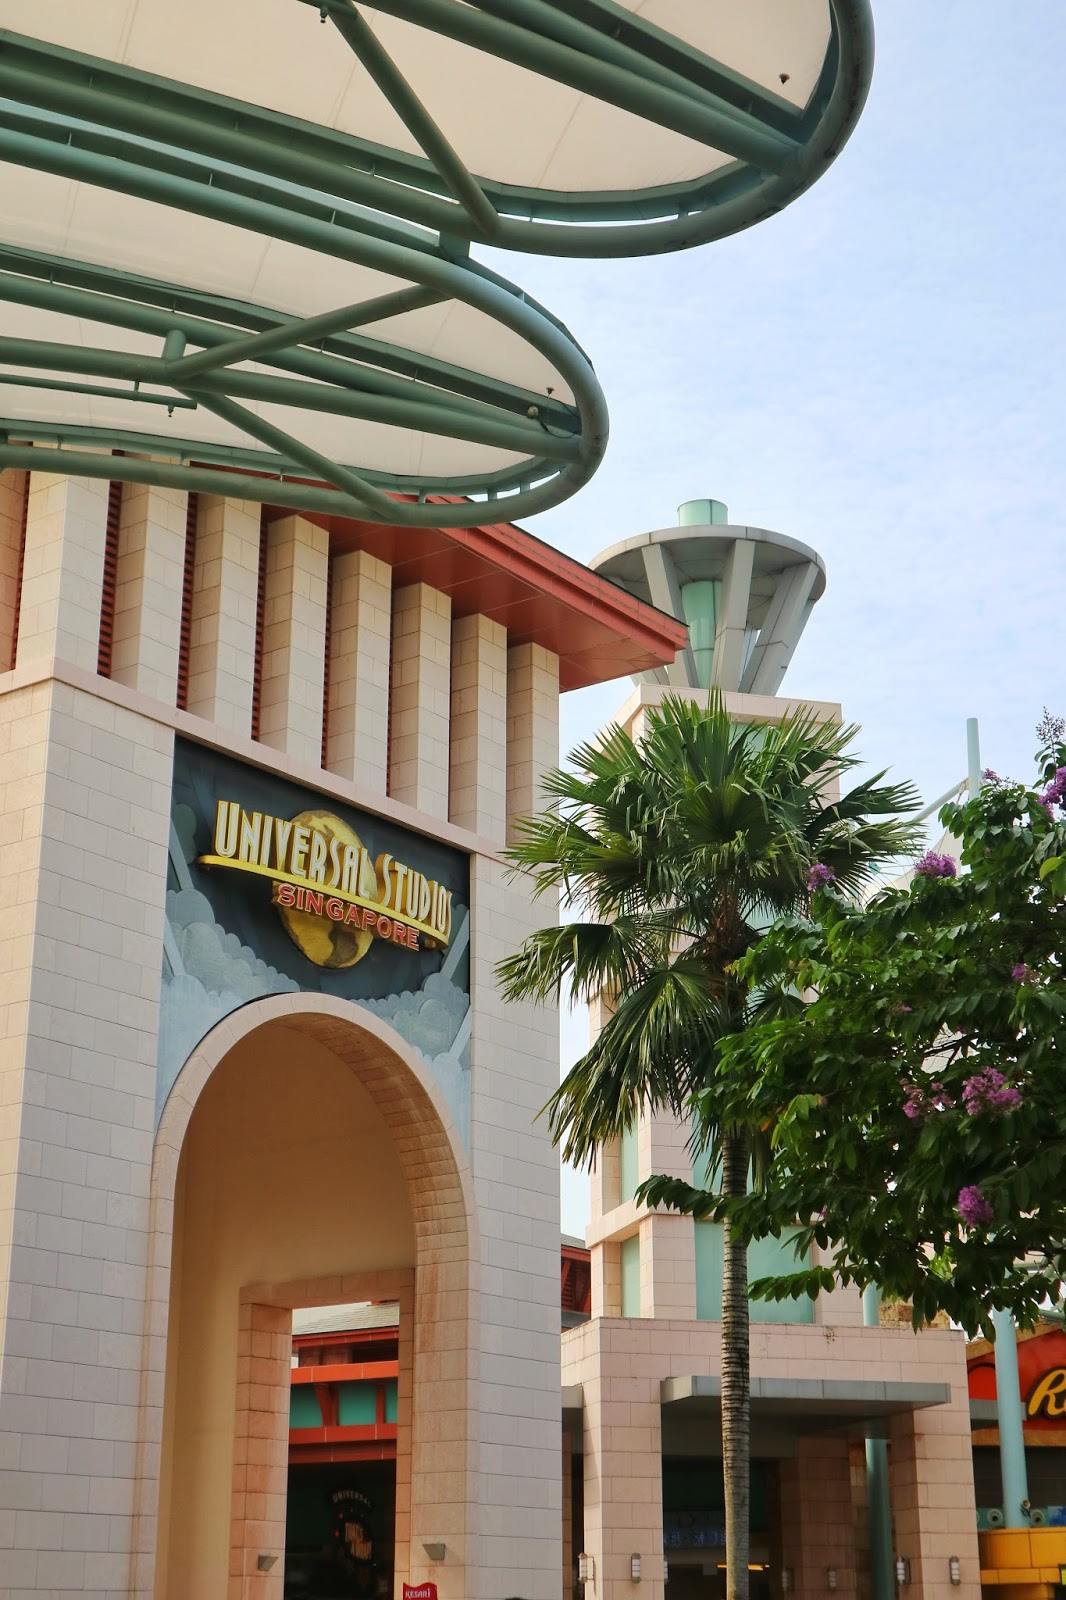 The entrance - Universal Studios Singapore